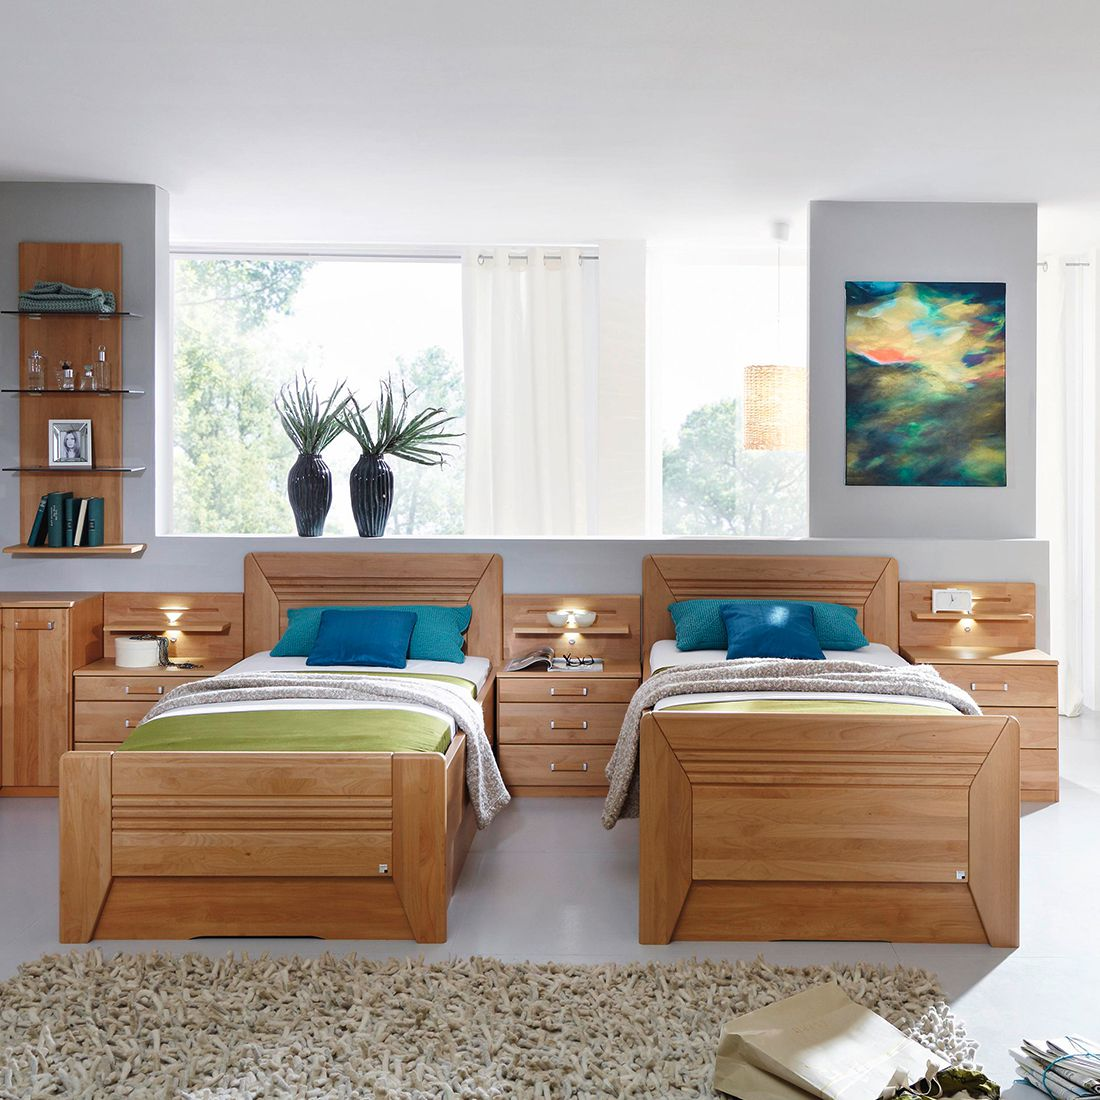 home24 Teilmassives Komfortbett Valerie III   Schlafzimmer > Betten > Komfortbetten